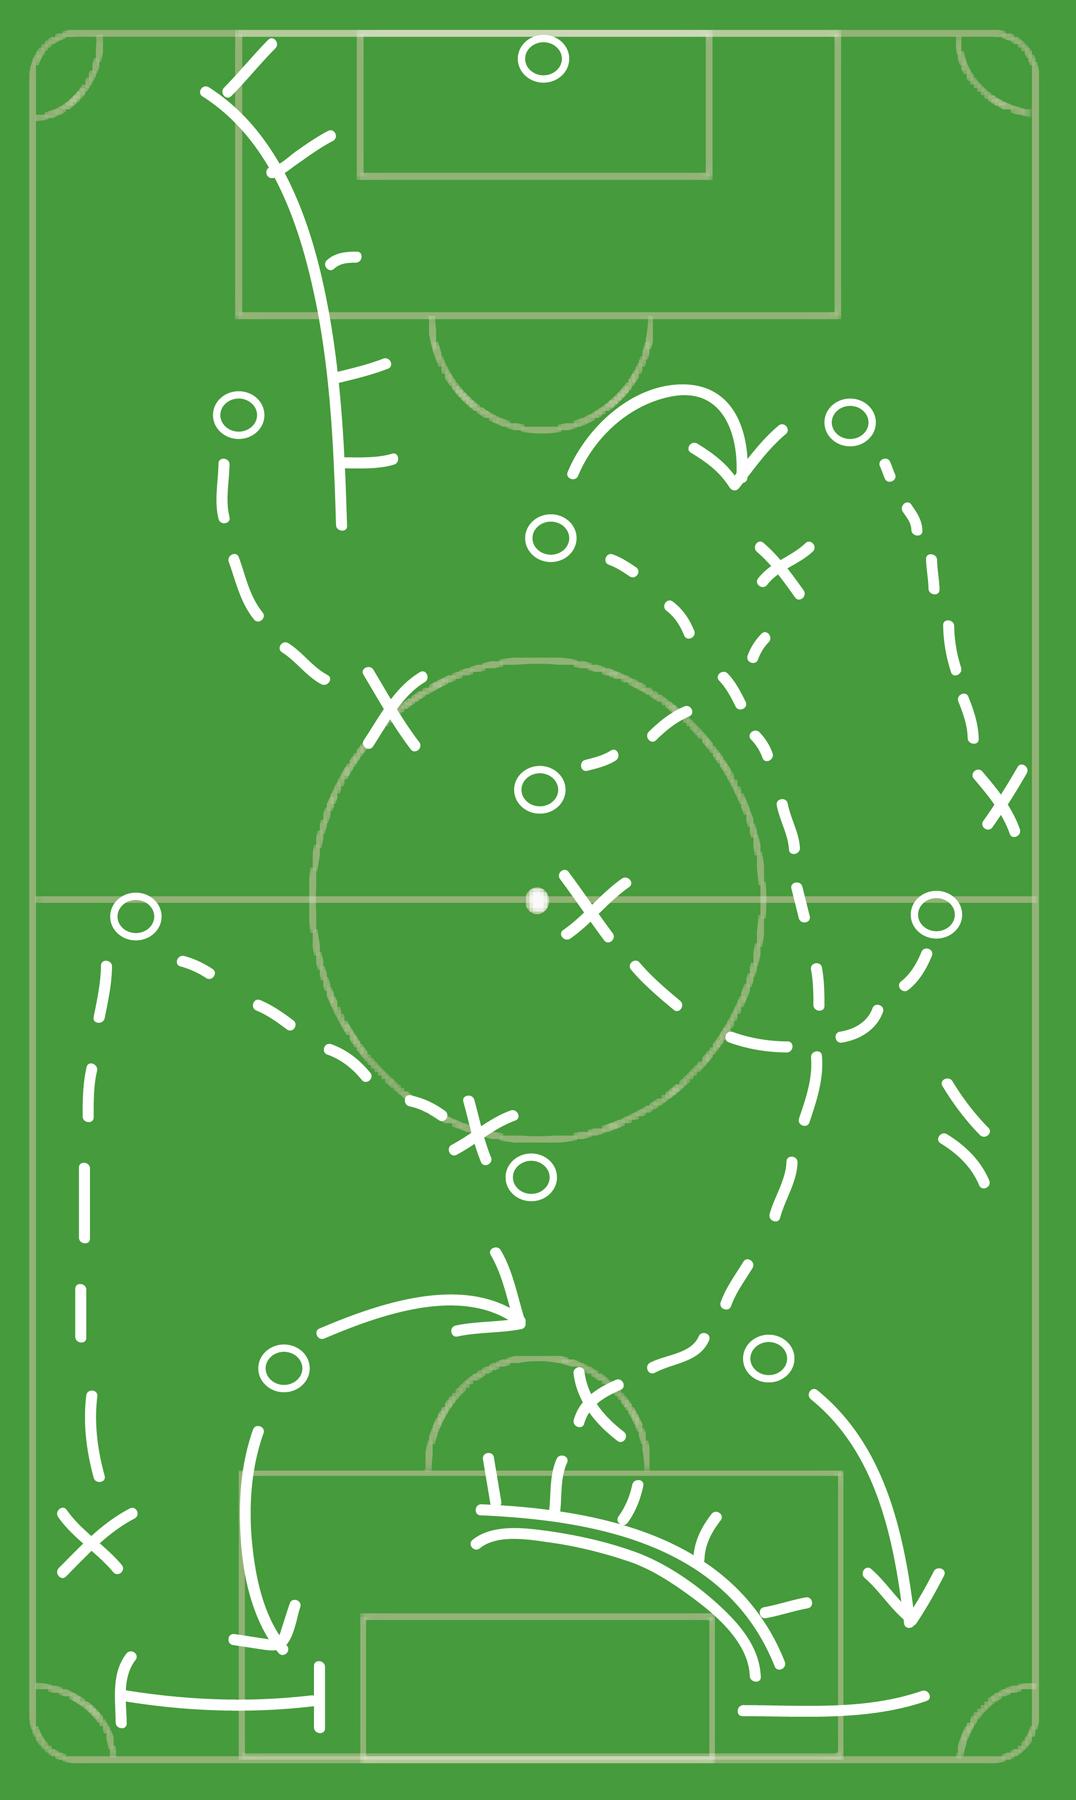 felix dudley: The Game Plan Wallpaper